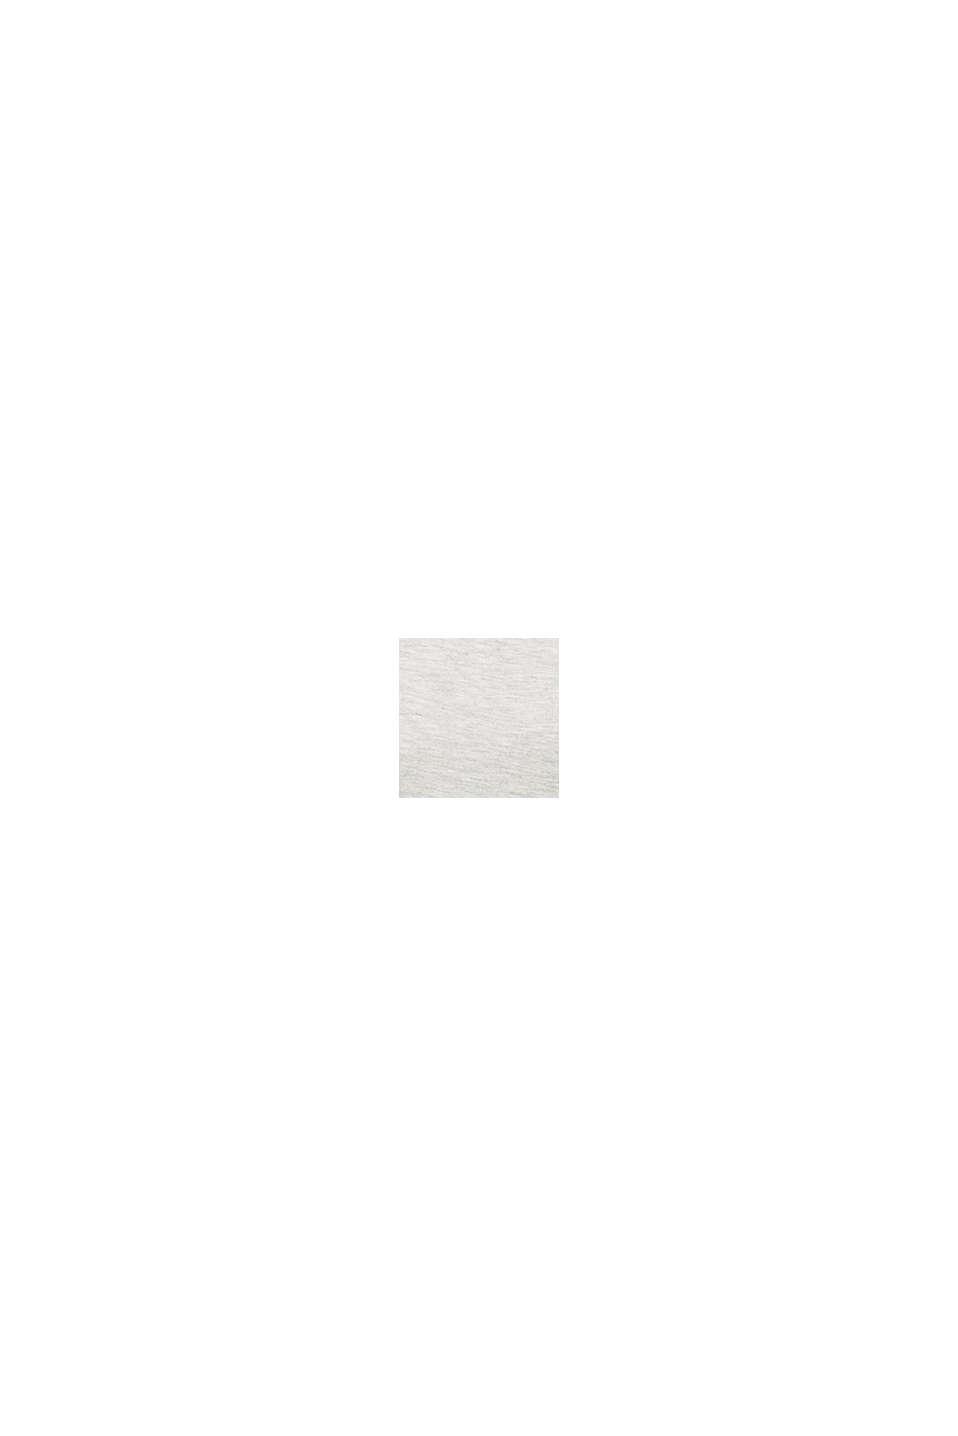 LIGHT GREY Melange-Longsleeve, LIGHT GREY, swatch